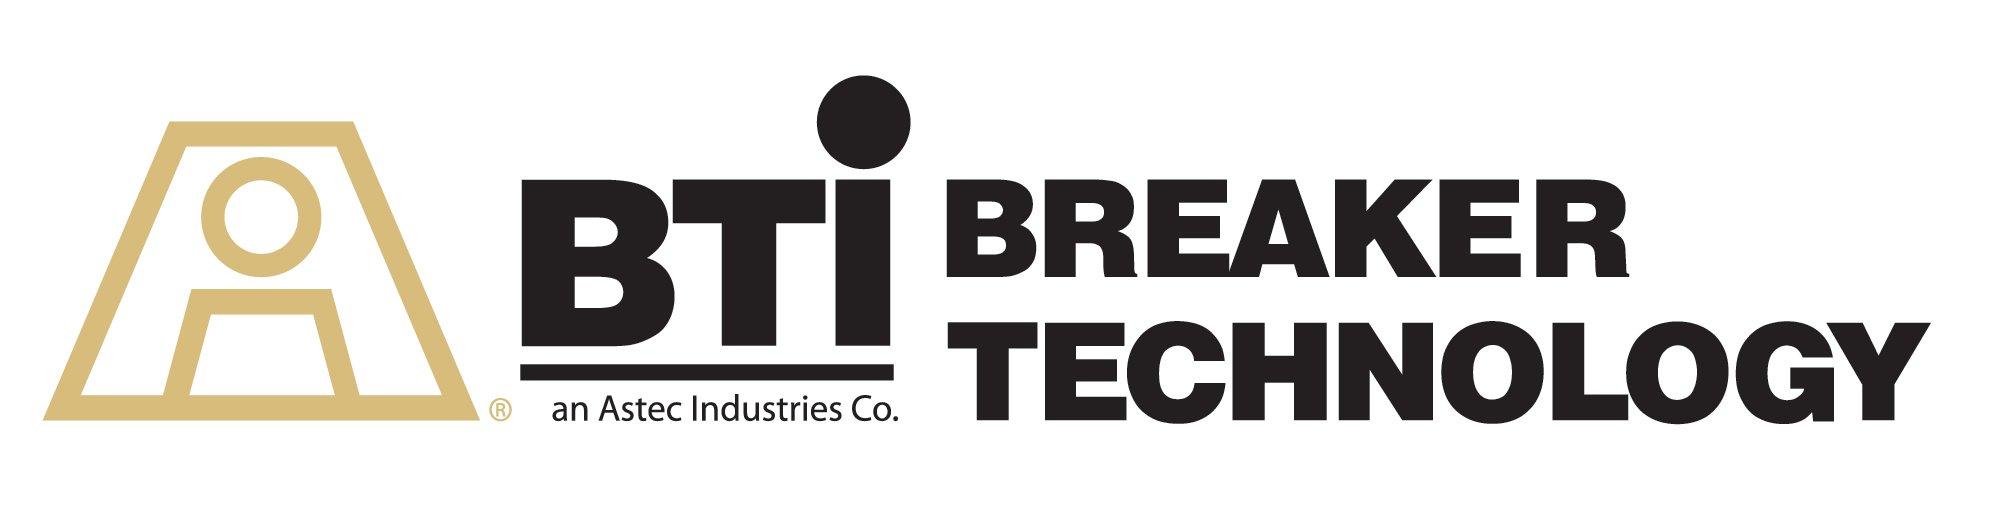 BTi_logo-Horizontal_2014-01